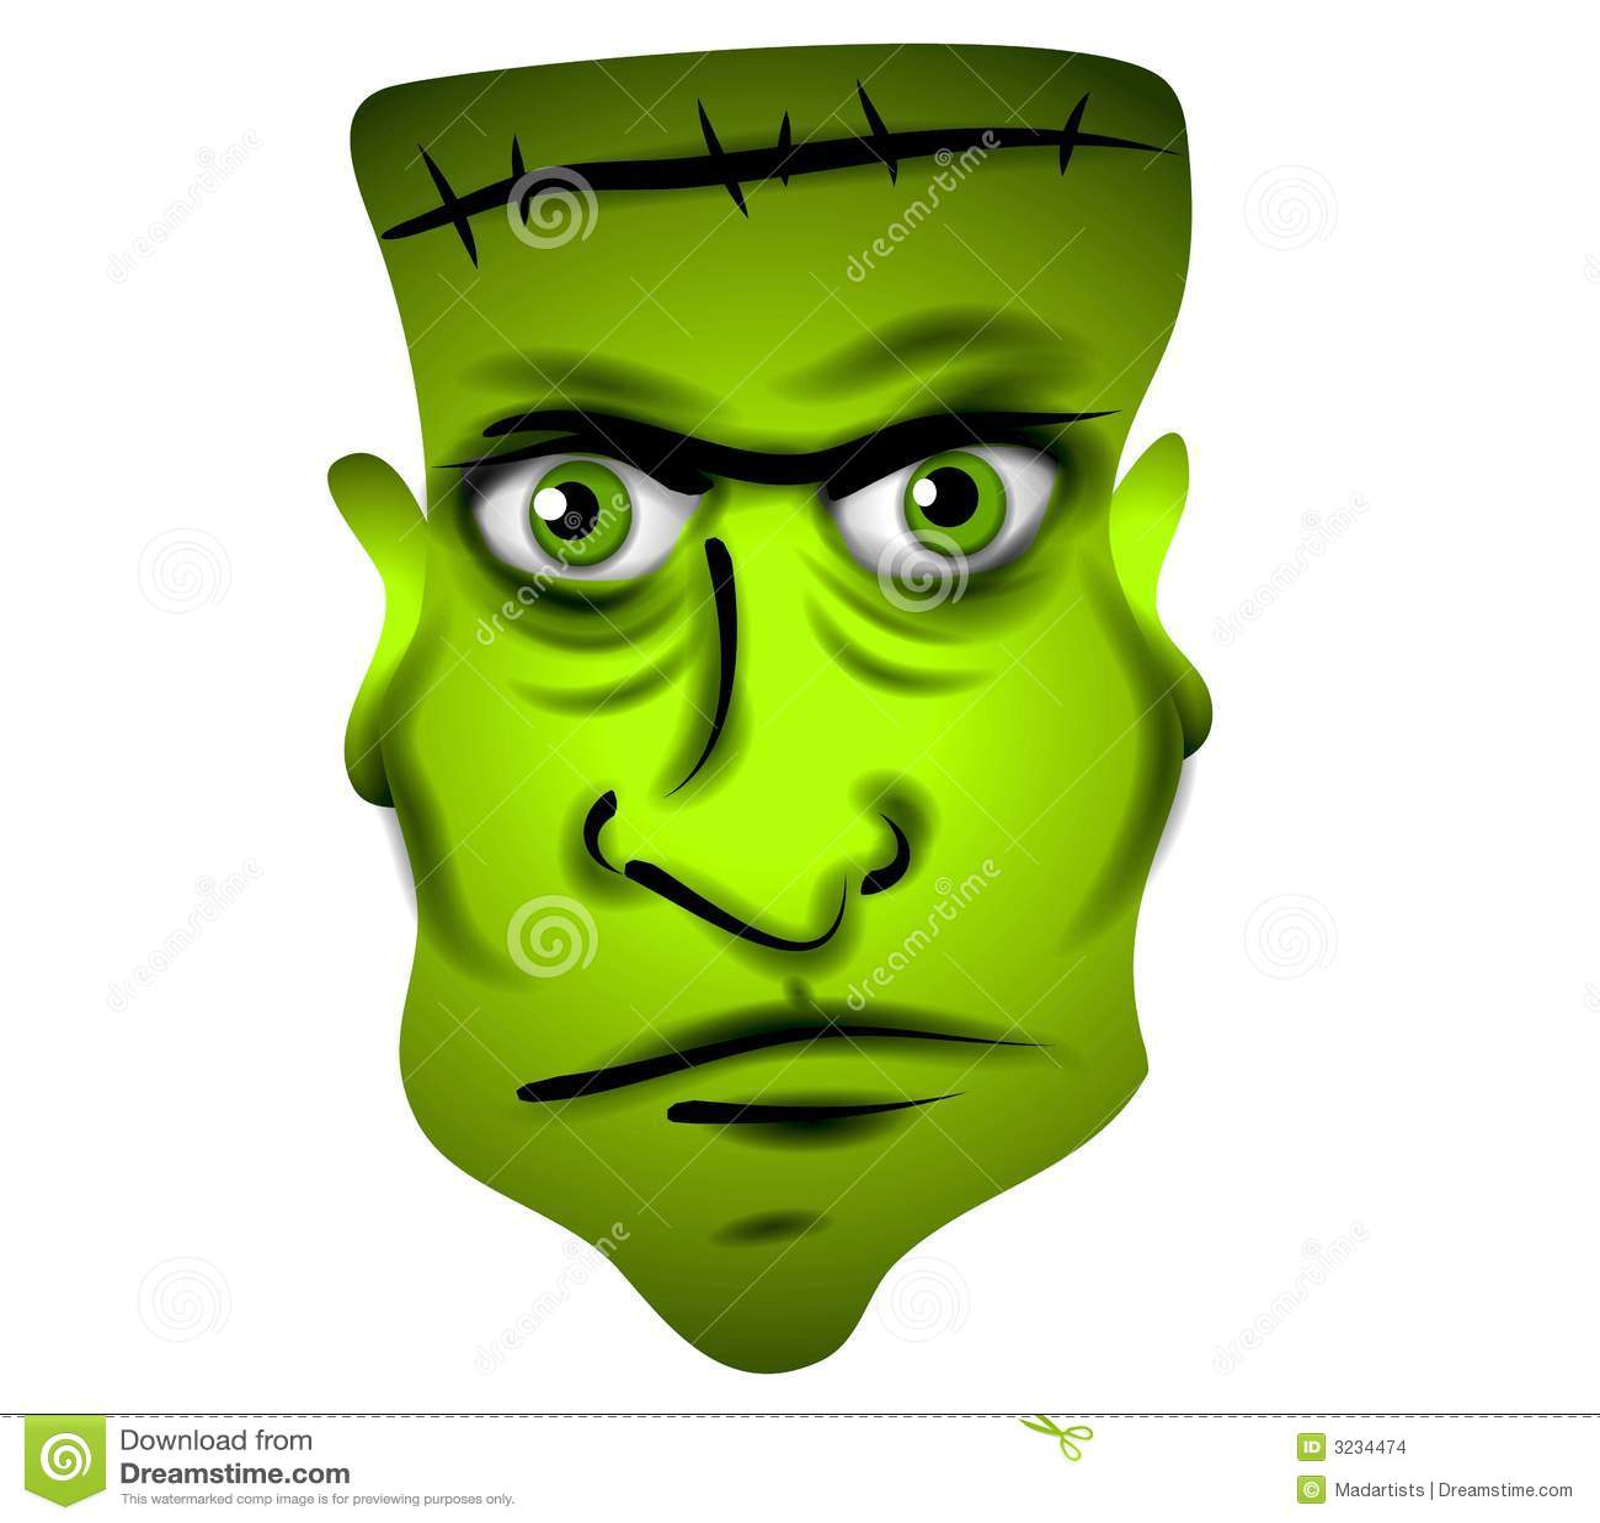 Frankenstein Face Clip Art Stock Images - Image: 3234474